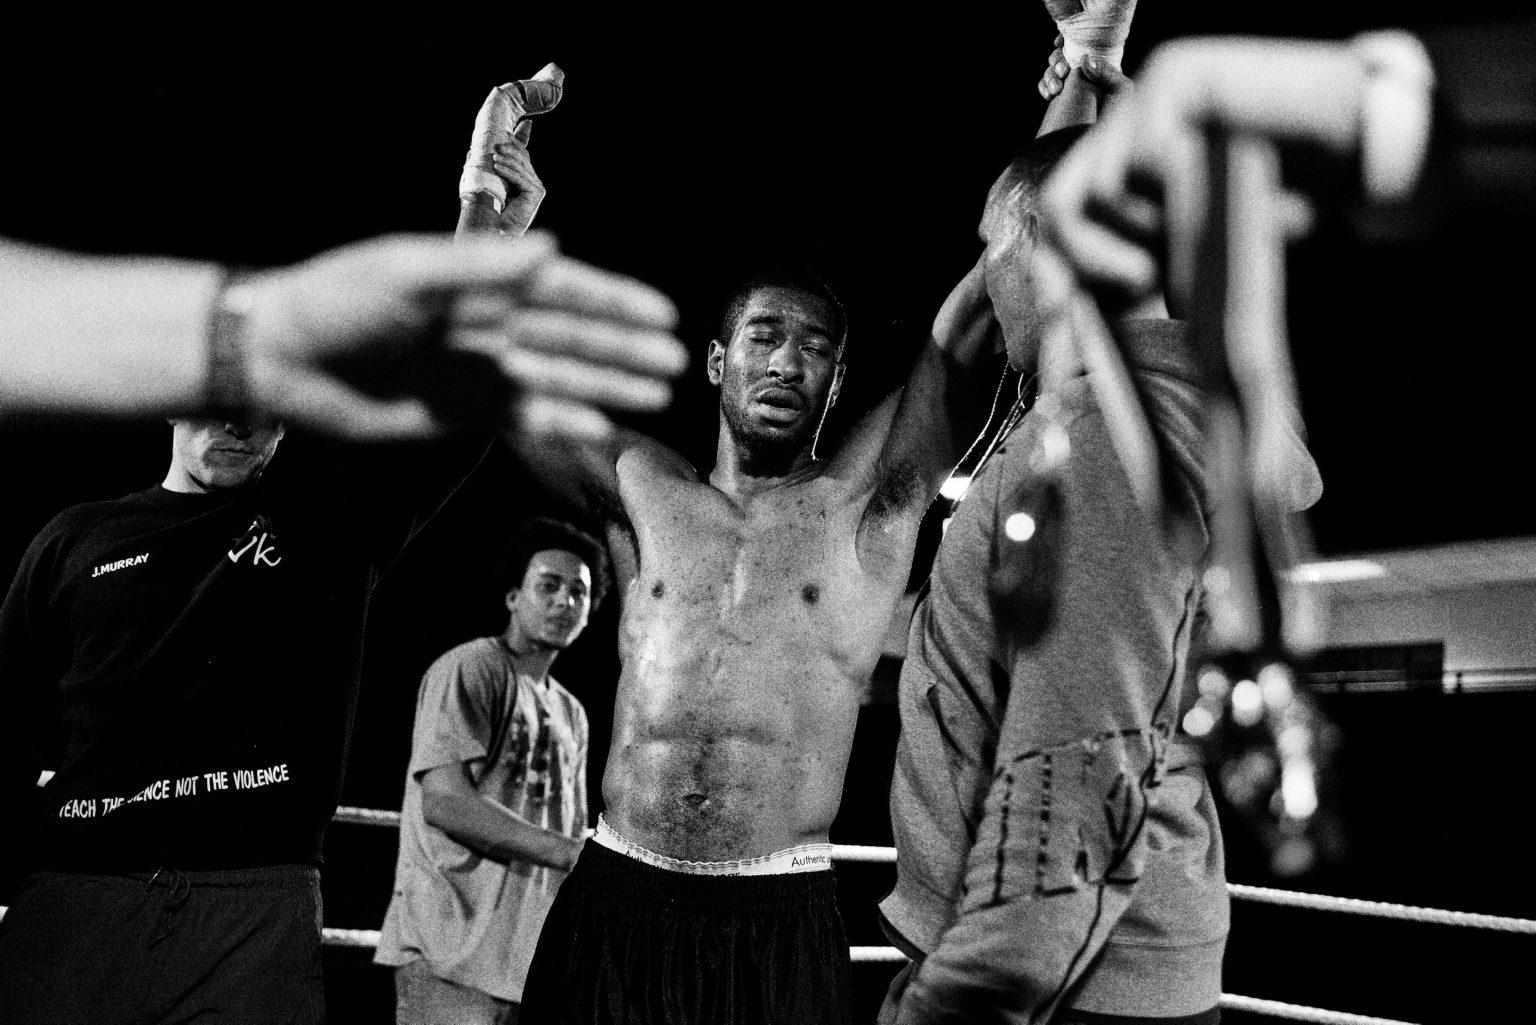 unlicensed-boxing-in-london-2